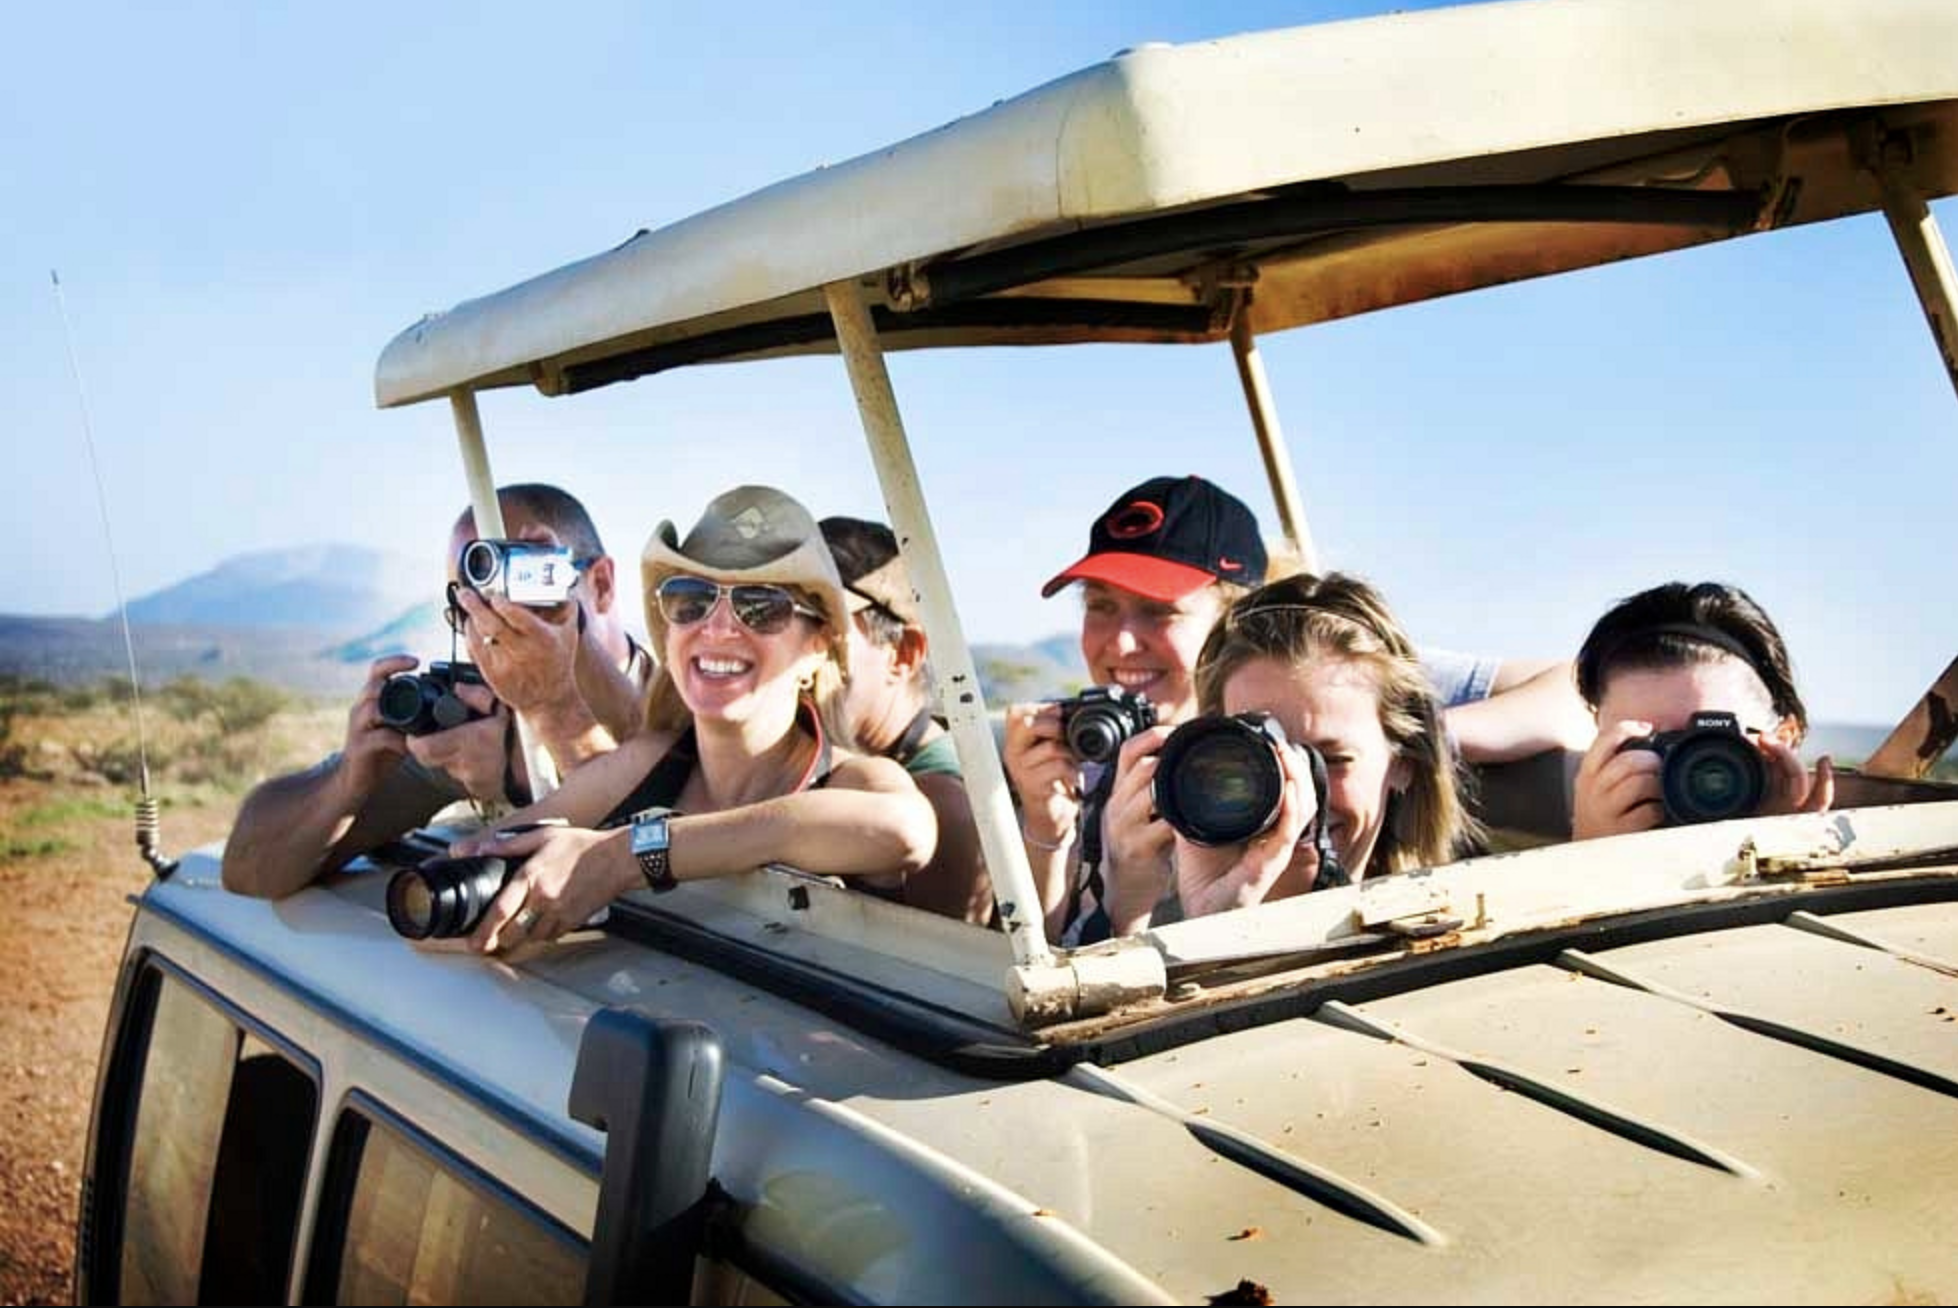 PhotoFly Travel Club | Screen Shot 2020-06-20 at 3.45.24 AM | PhotoFly Travel Club